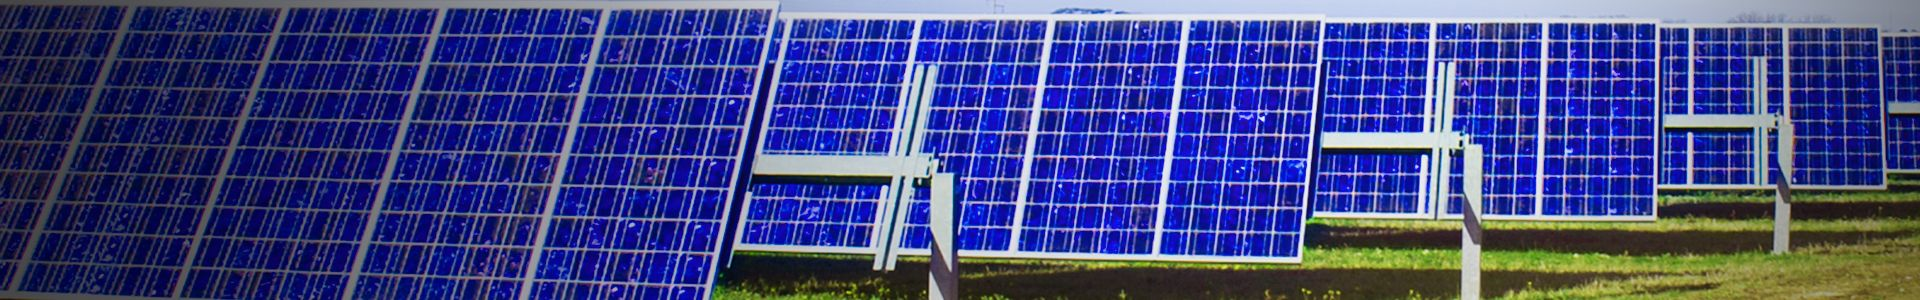 utility-renewable-energy--val-1920x300-solarpanel